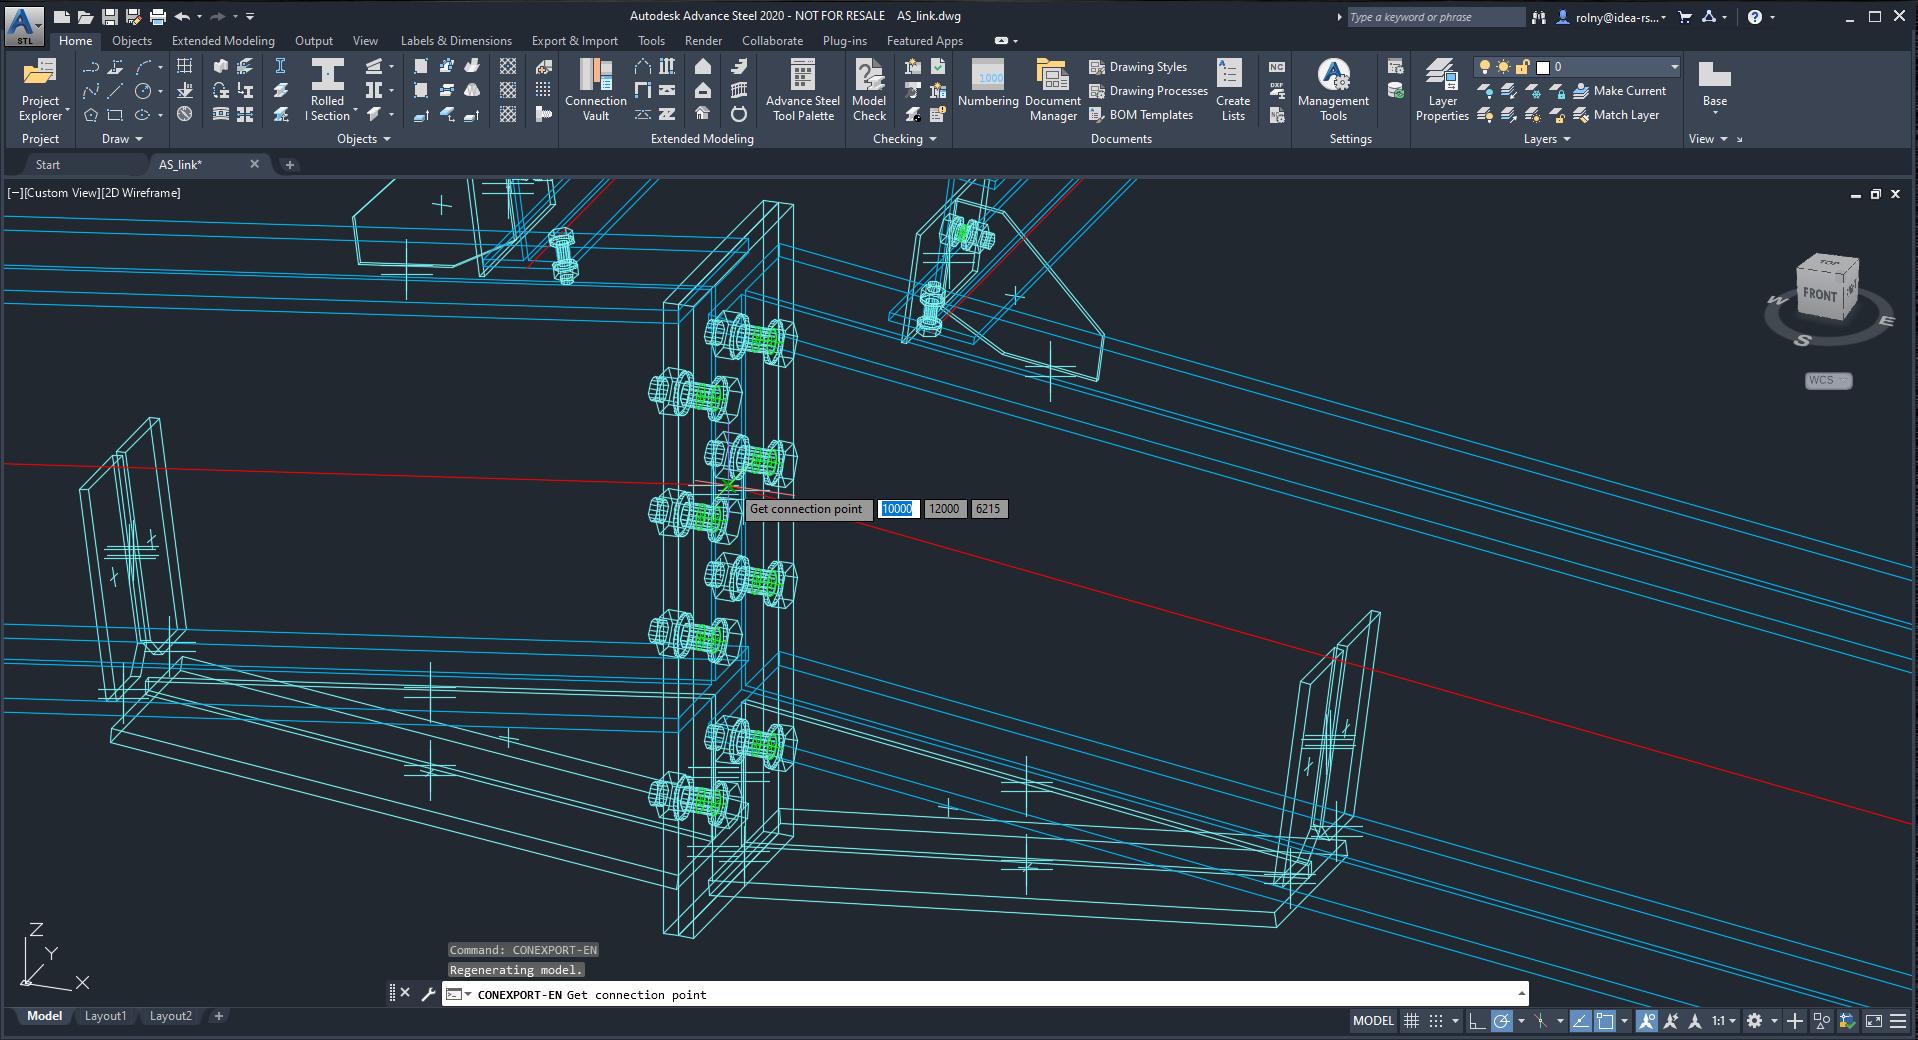 IDEA StatiCa Viewer for Autodesk Advance Steel